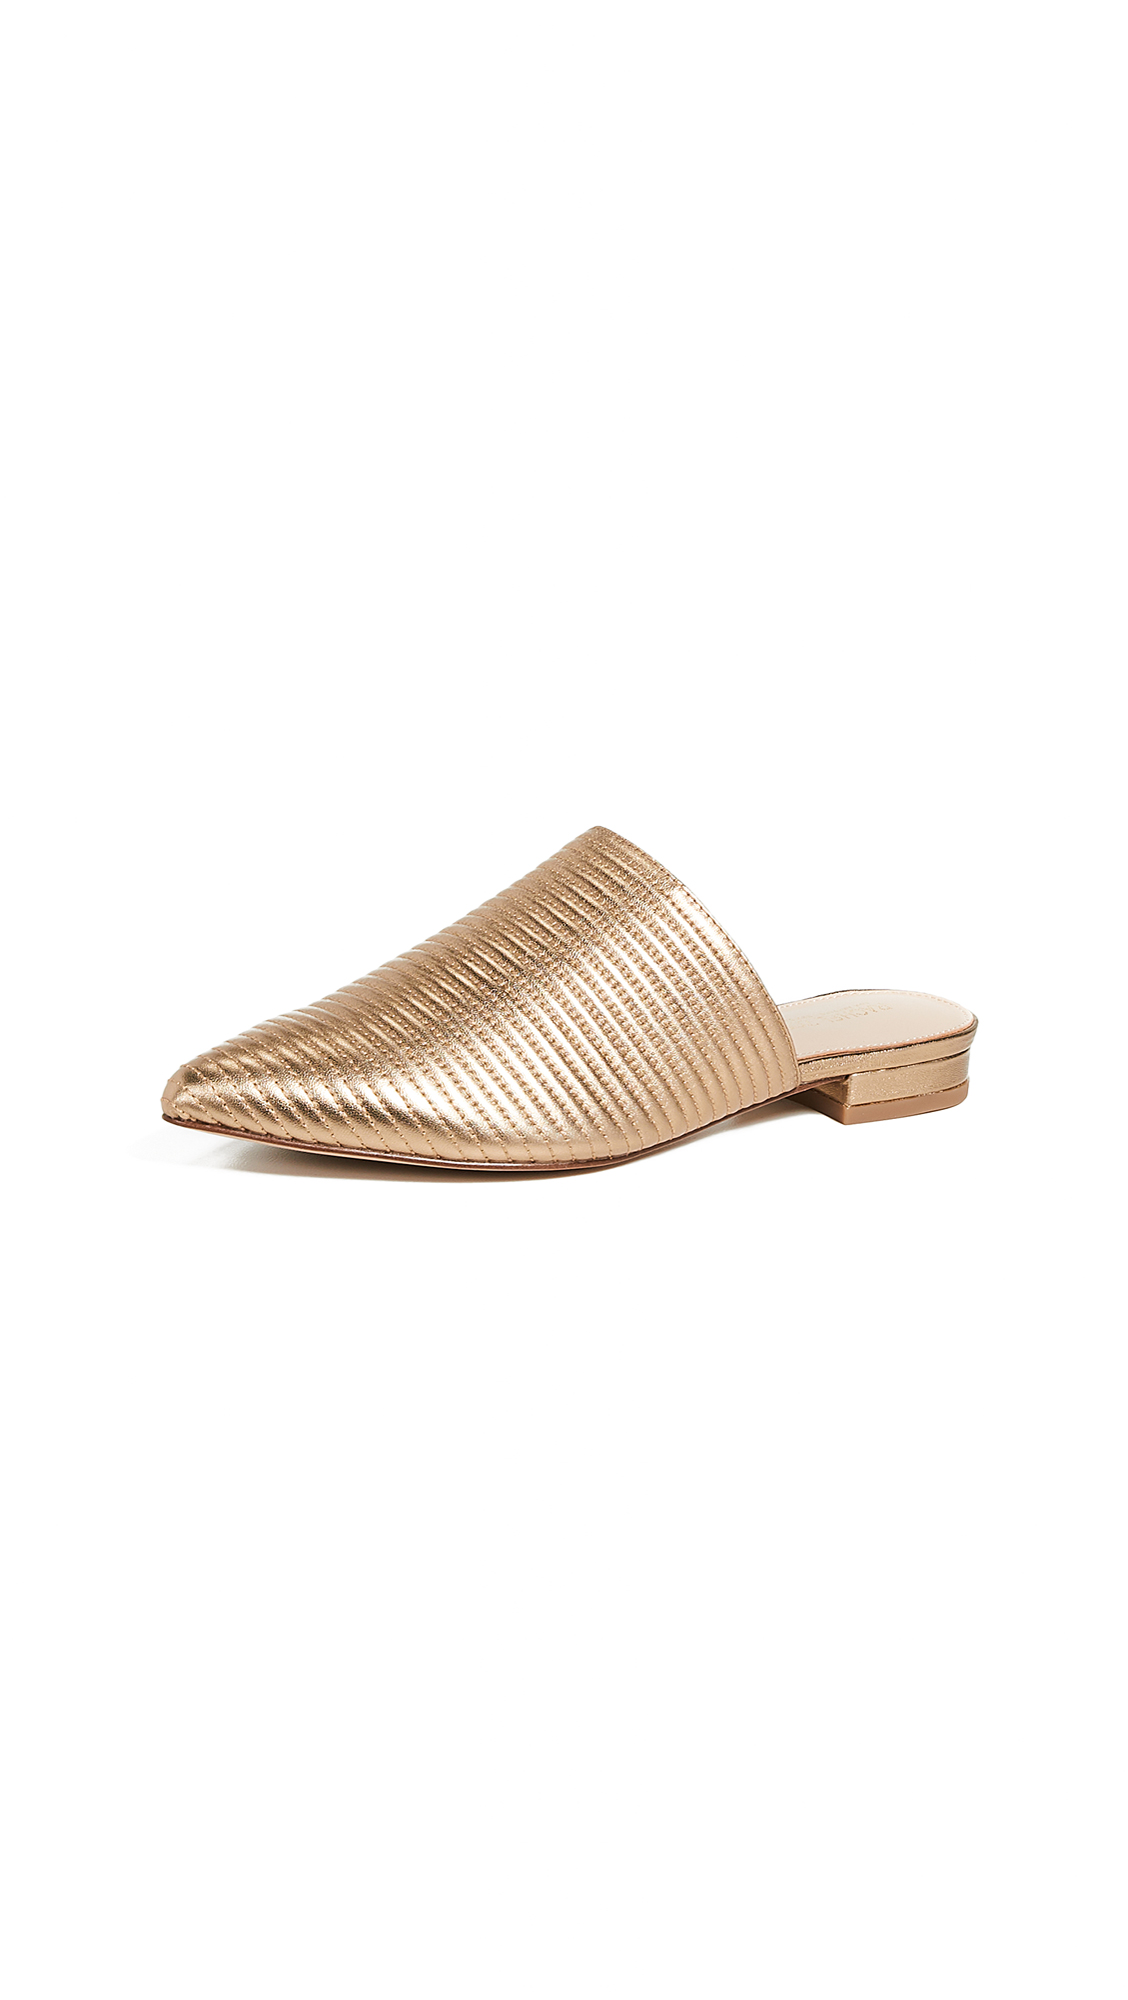 Rachel Zoe Luna Flat Mules - Gold Sand